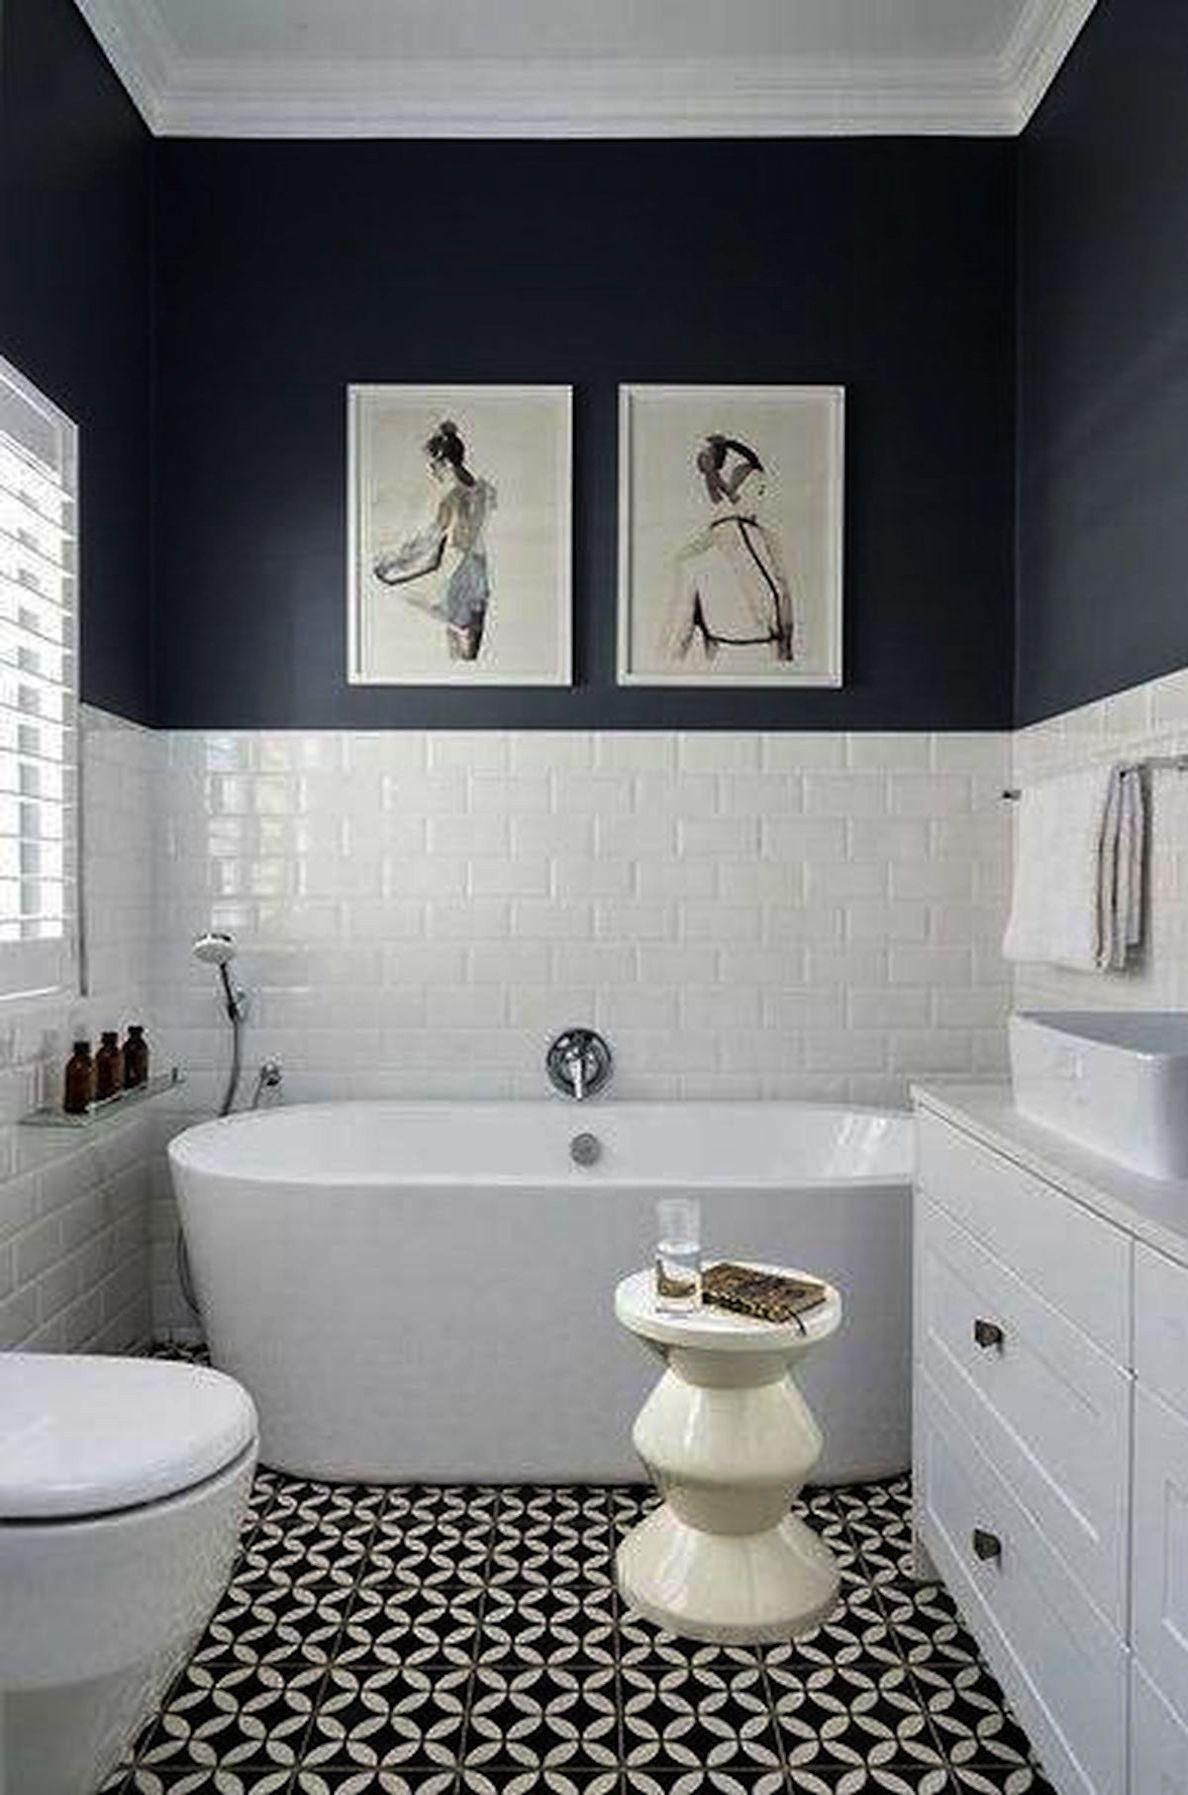 bathroom ideas rustic modern save small ensuite bathroom on bathroom renovation ideas modern id=57350